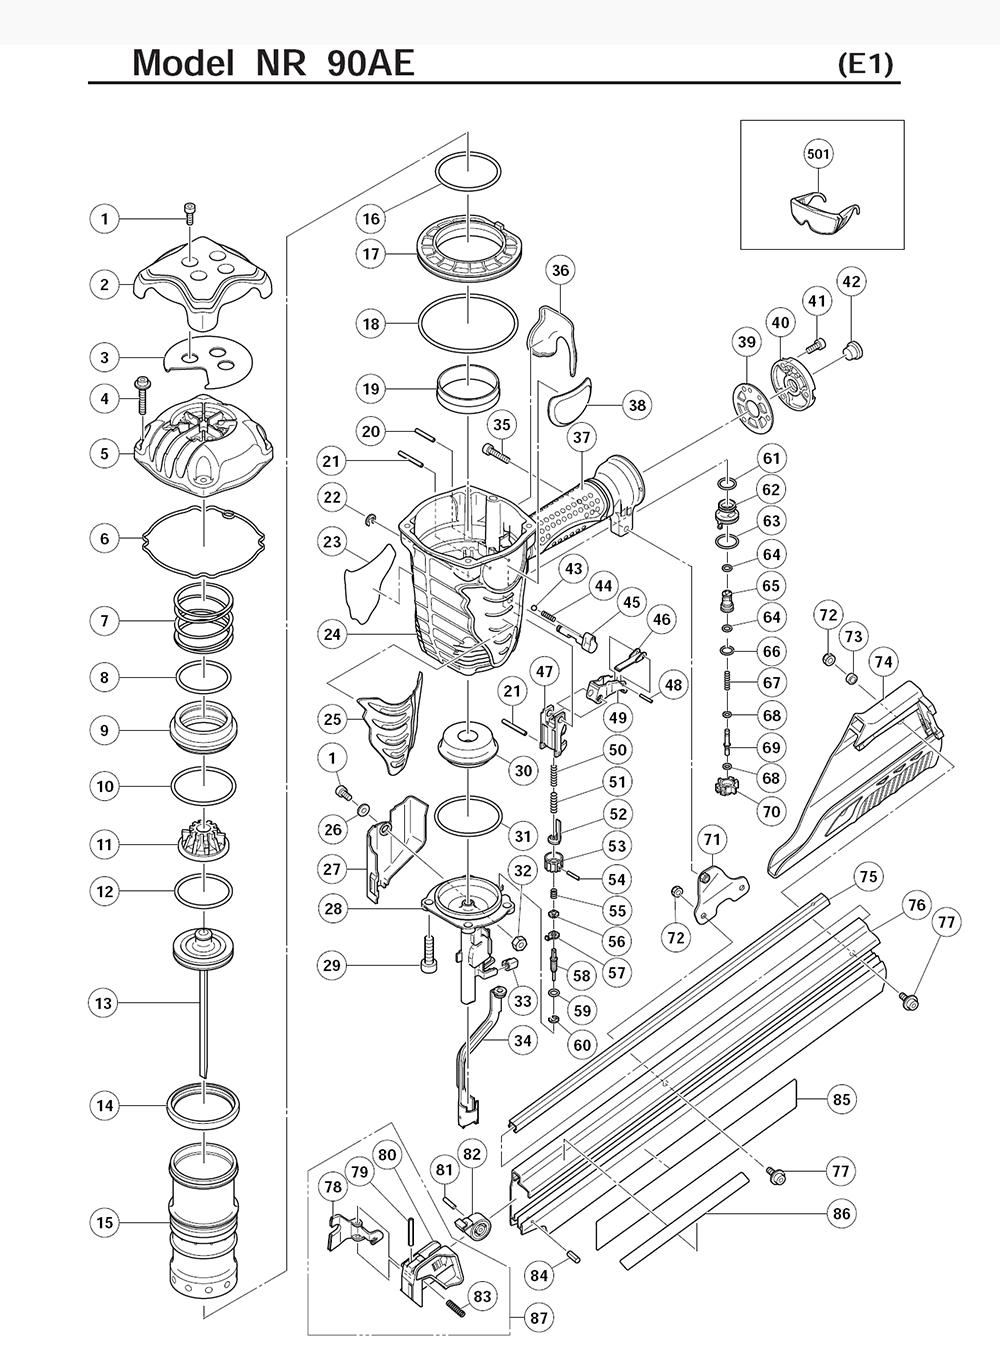 hitachi nr90ae parts schematic